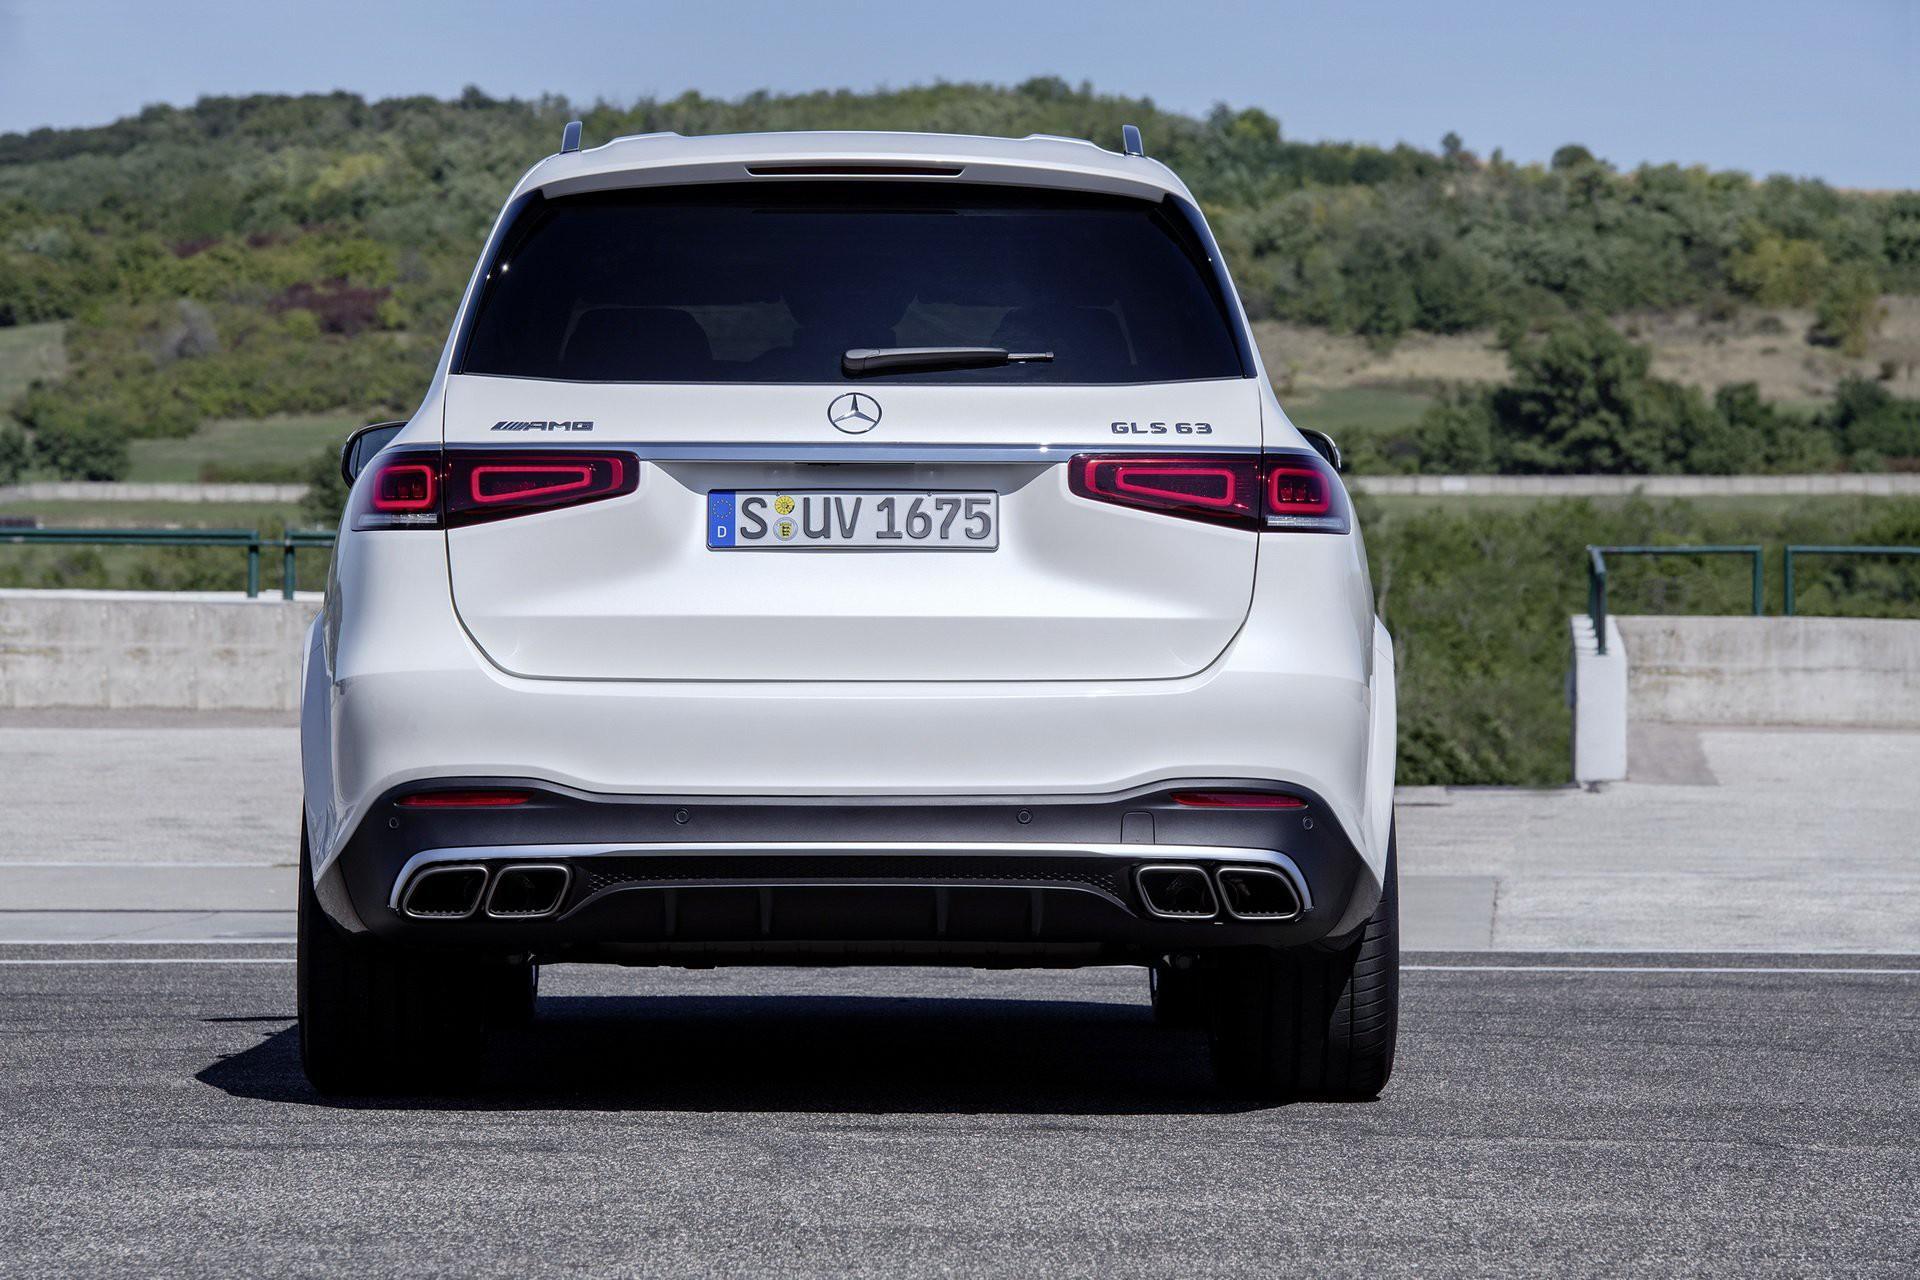 Khám phá Mercedes GLS 63 2020 vừa ra mắt Ảnh 10